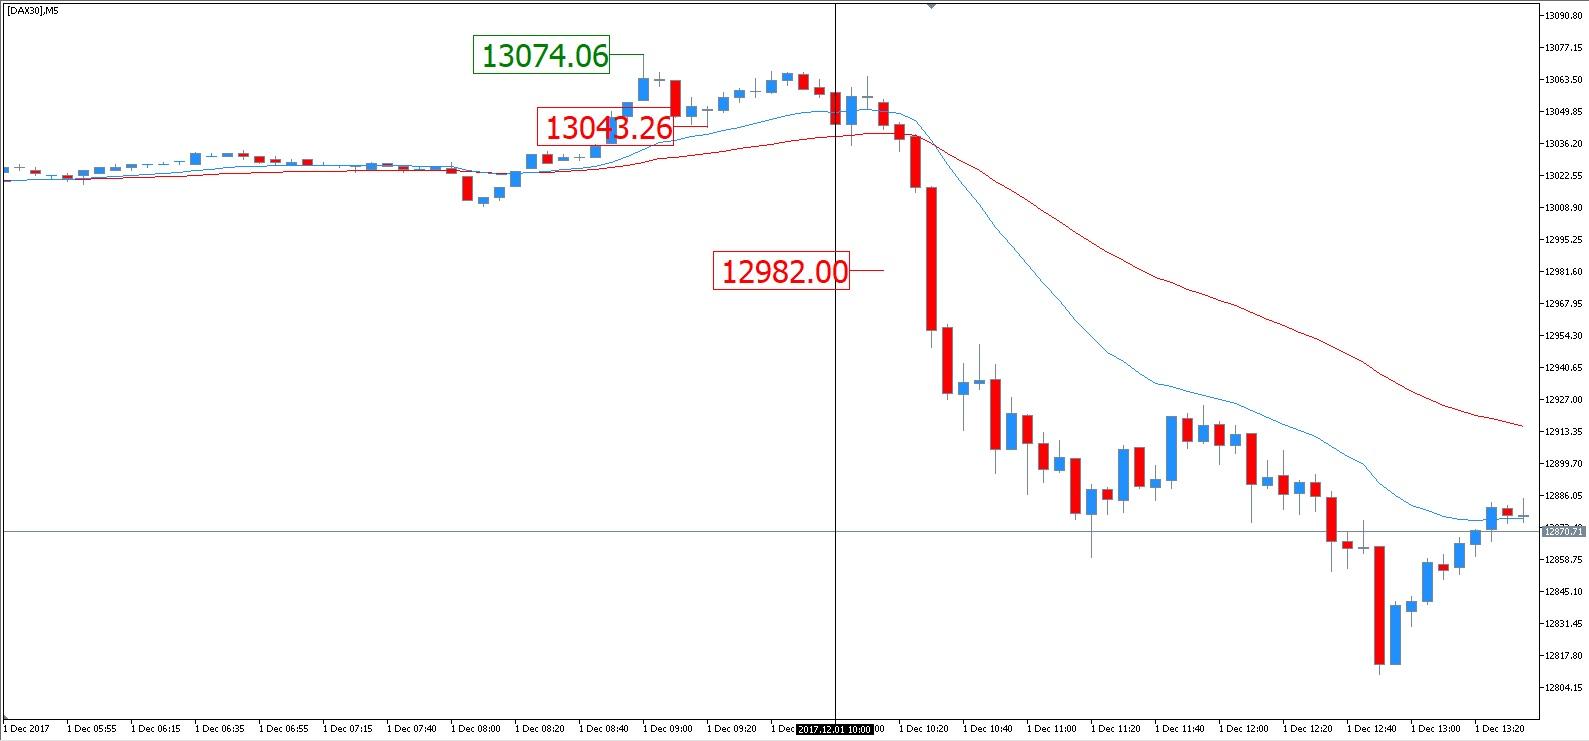 trading dax 30 - dax 30 realtime - dax30 forecast